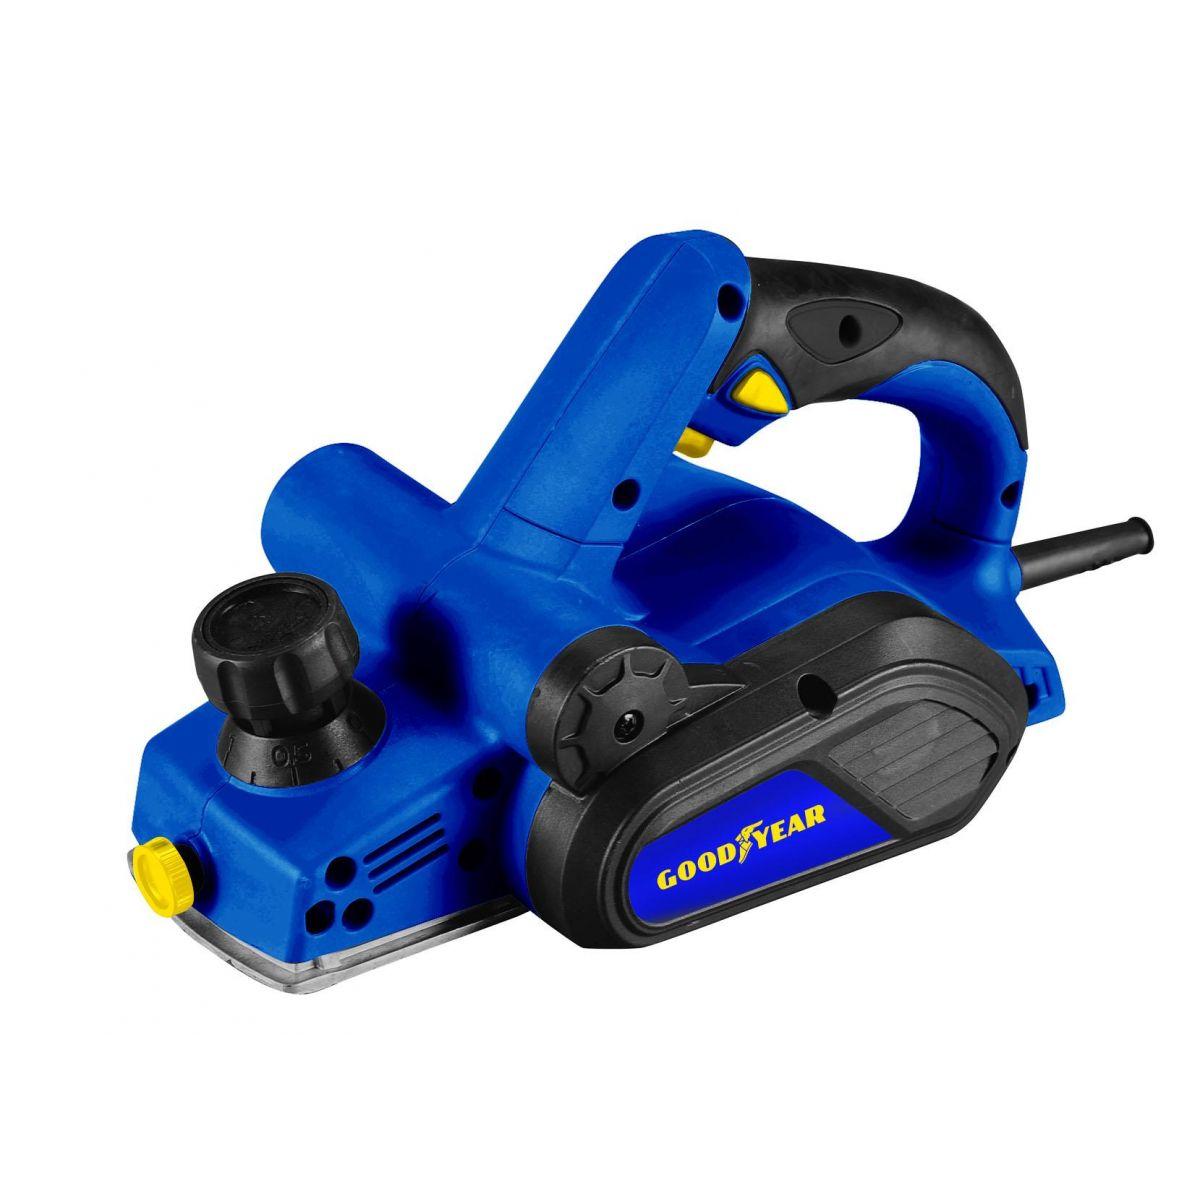 Plaina Elétrica 750w Profissional GY PL 90000-1 - Goodyear 220v